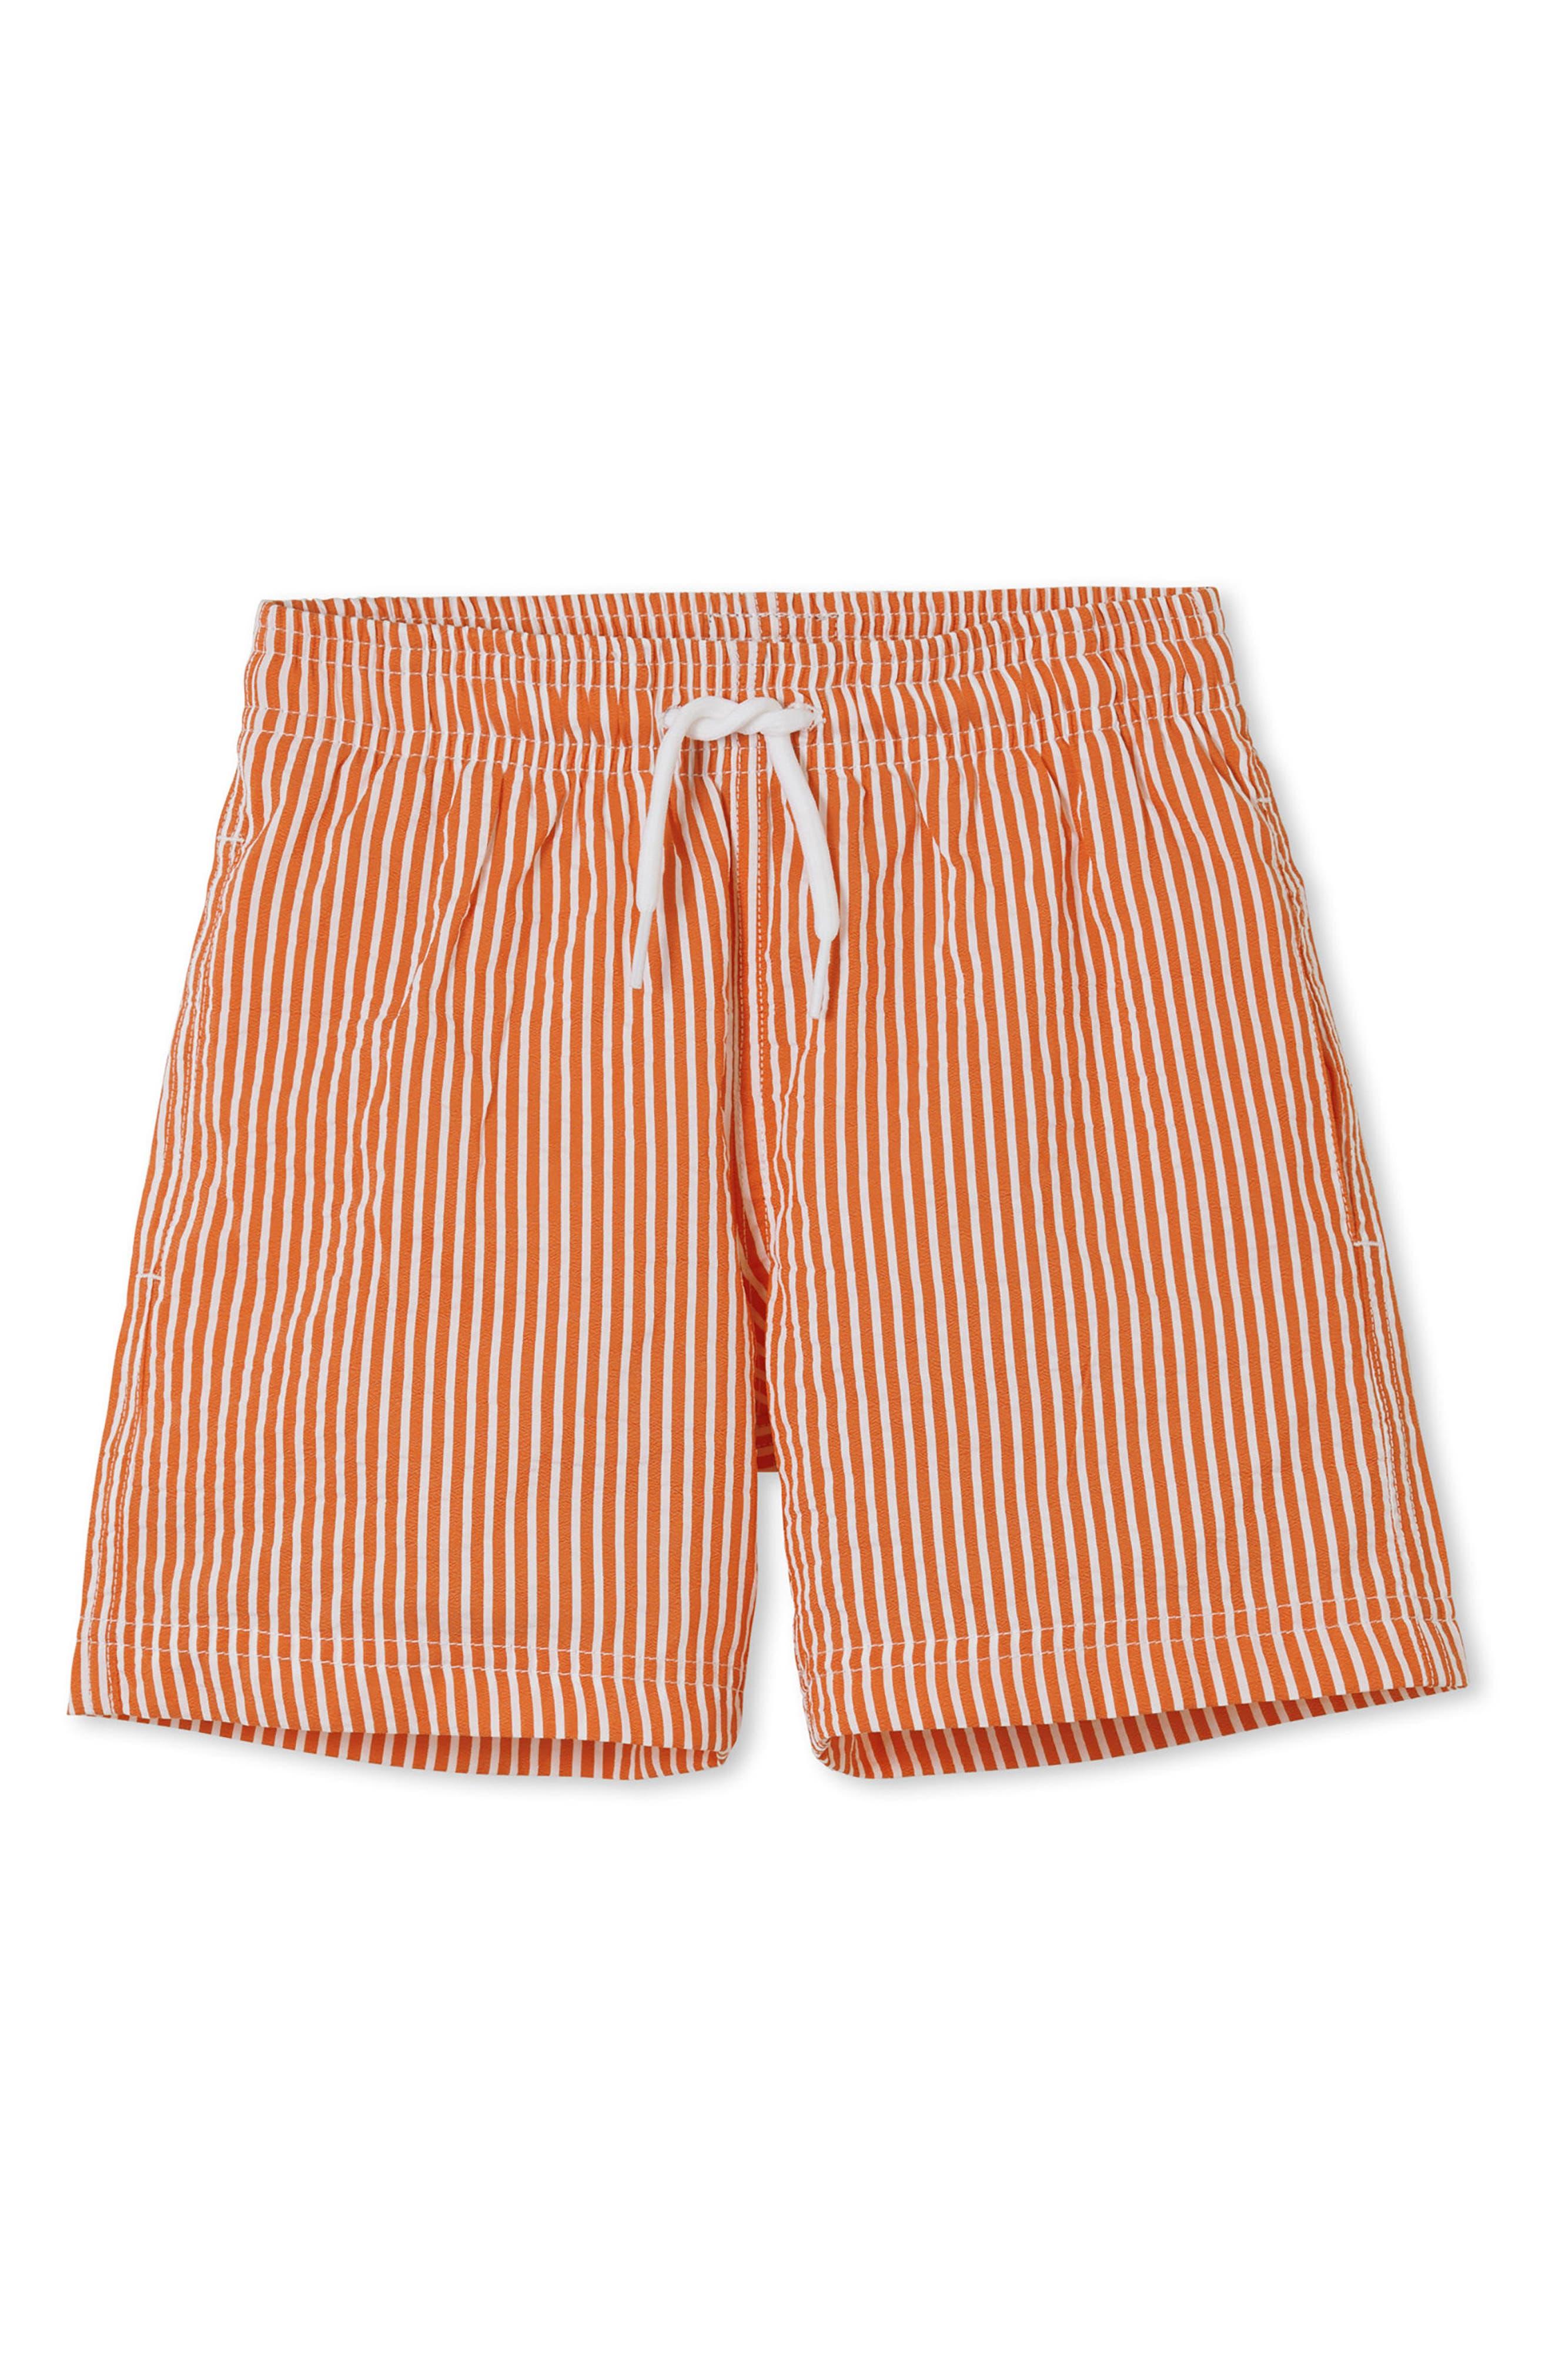 Main Image - Stella Cove Orange Stripe Swim Trunks (Toddler Boys & Little Boys)